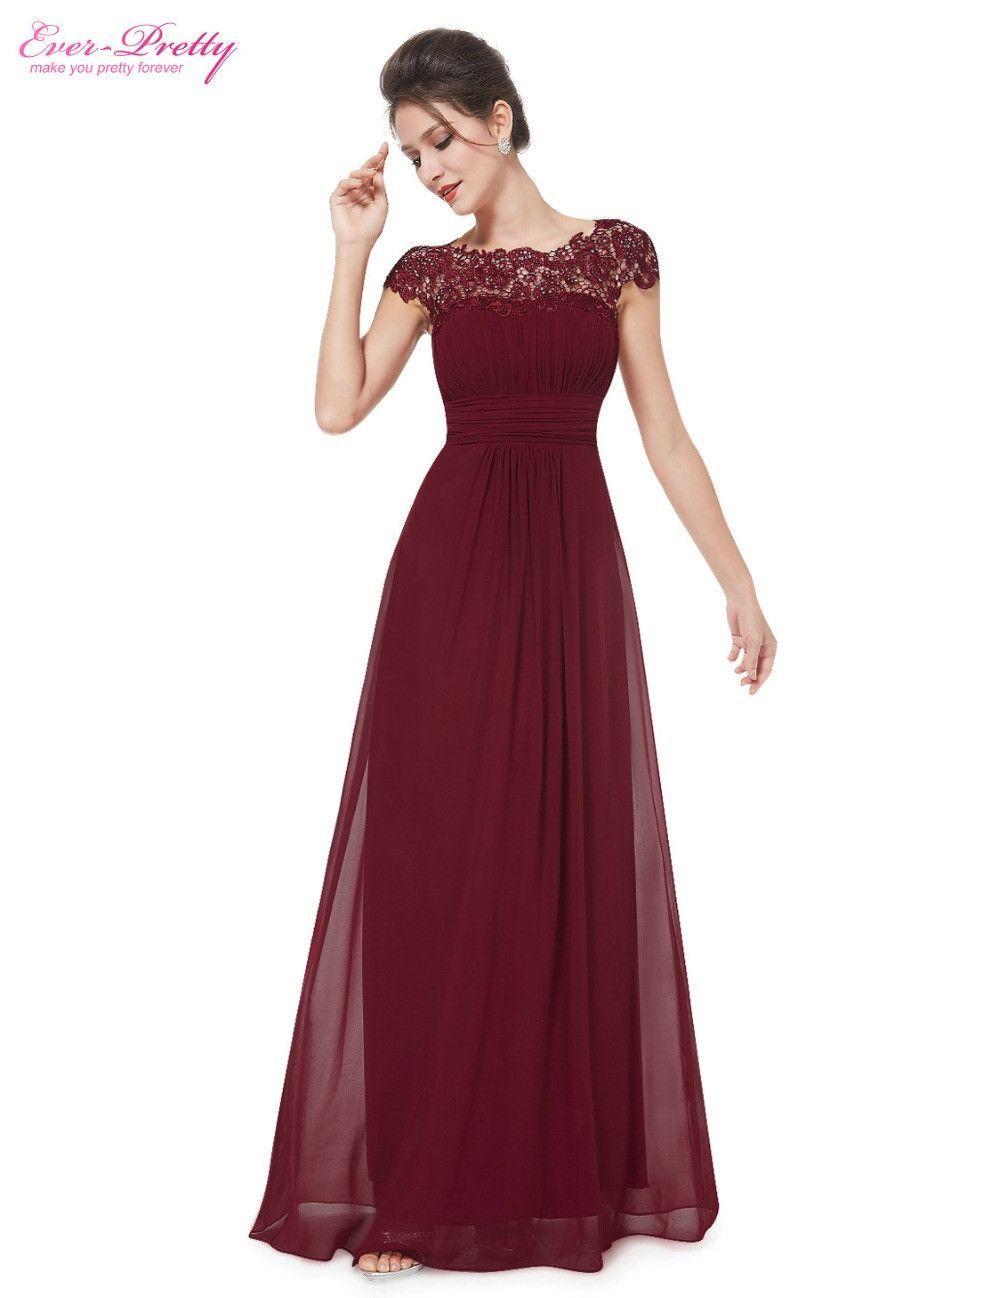 19e05b4276761 Evening Dresses Newest Free Shipping EP09993 Black Lace Neckline ...